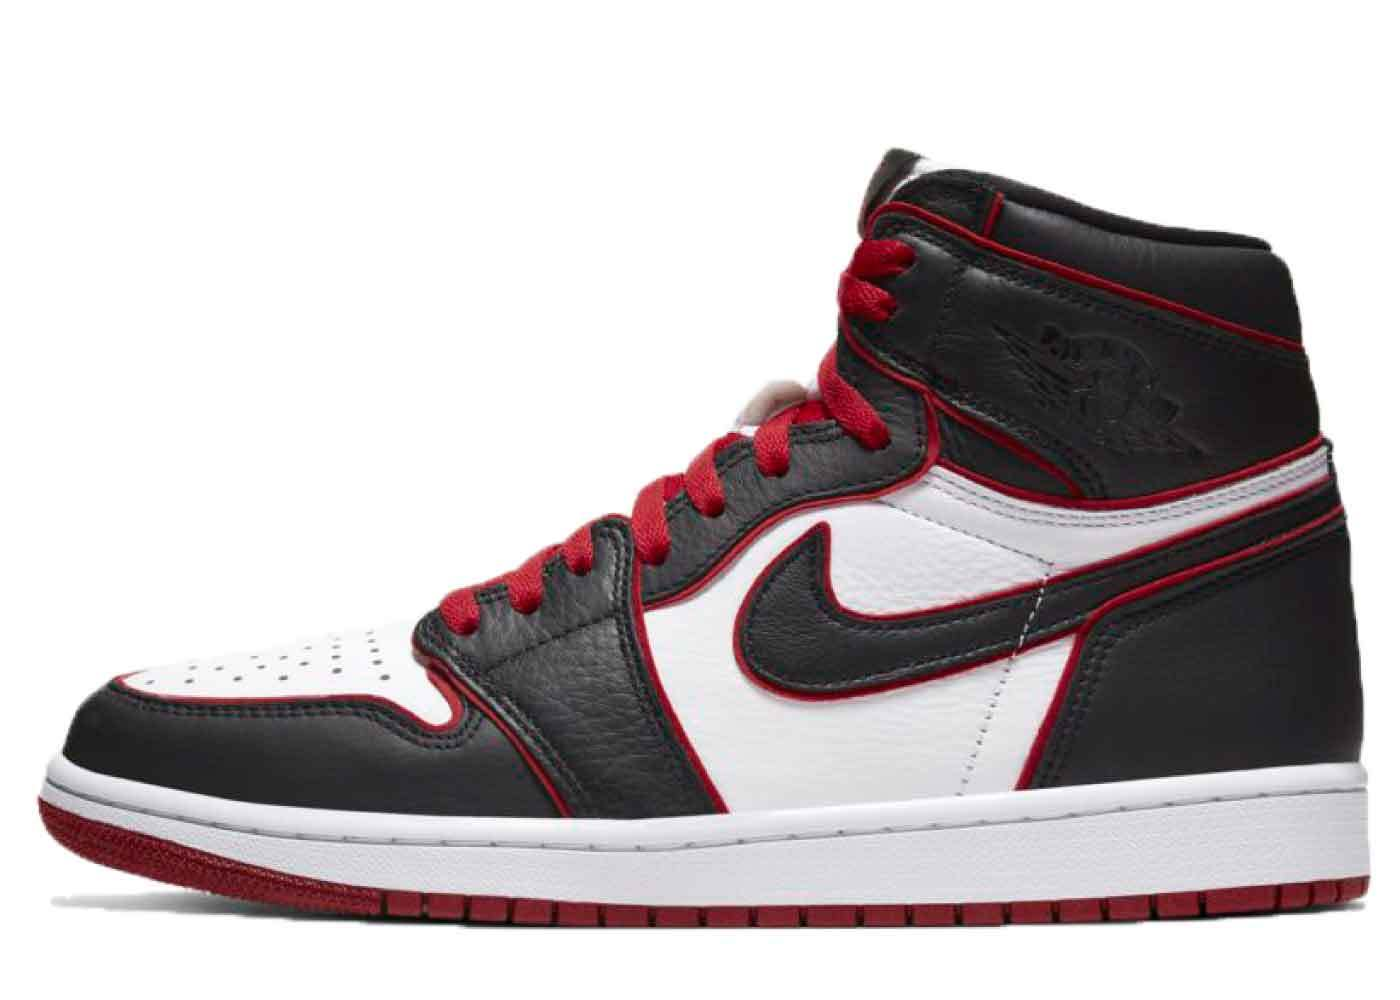 Nike Air Jordan 1 Retro High Bloodlineの写真